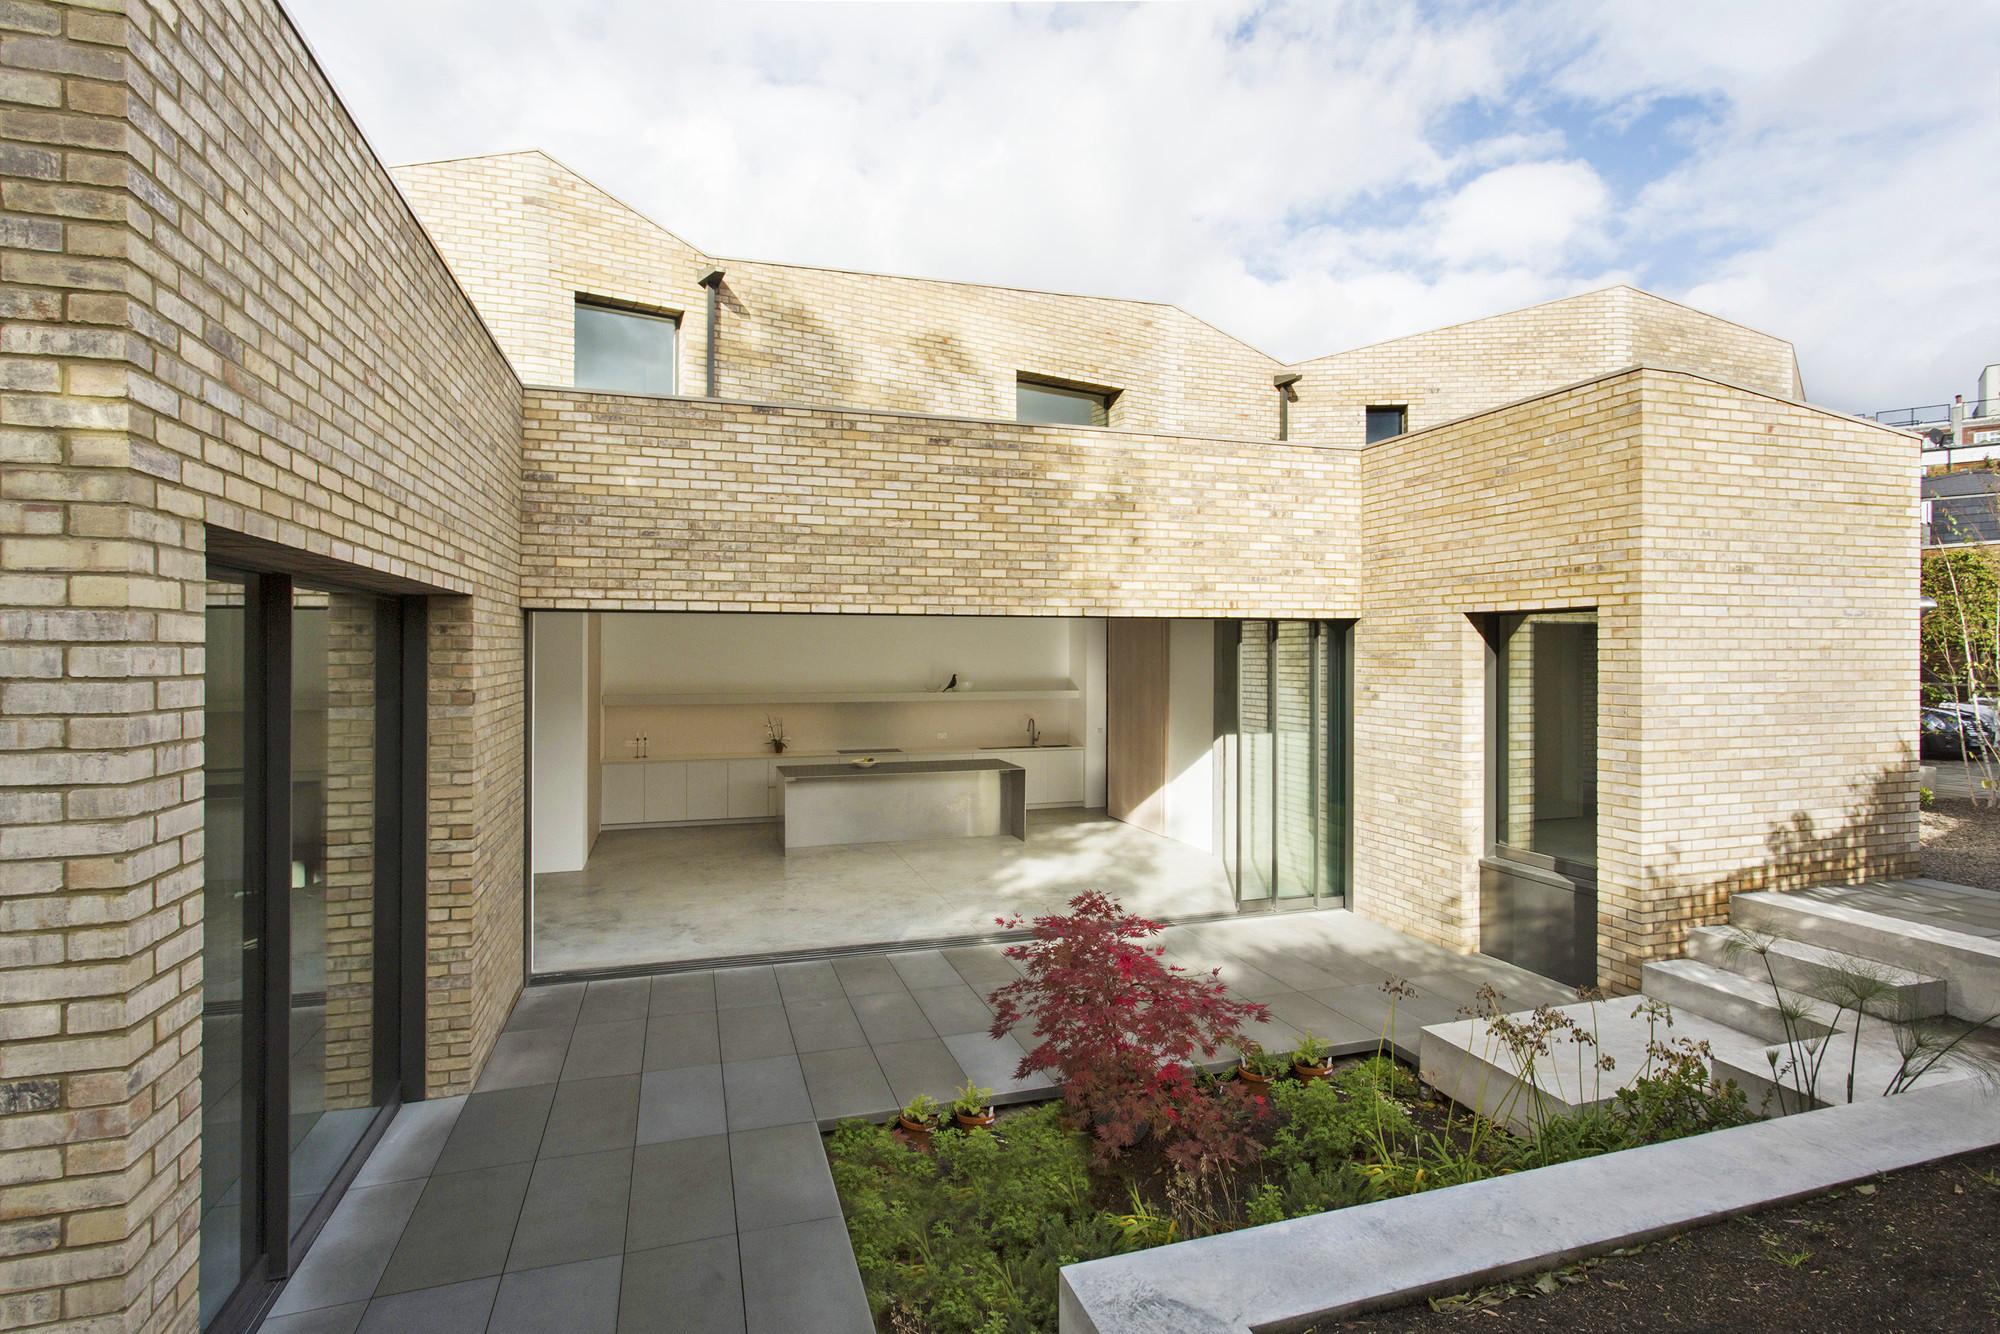 Gallery Of Luker House In Barnes Jamie Fobert Architects 4